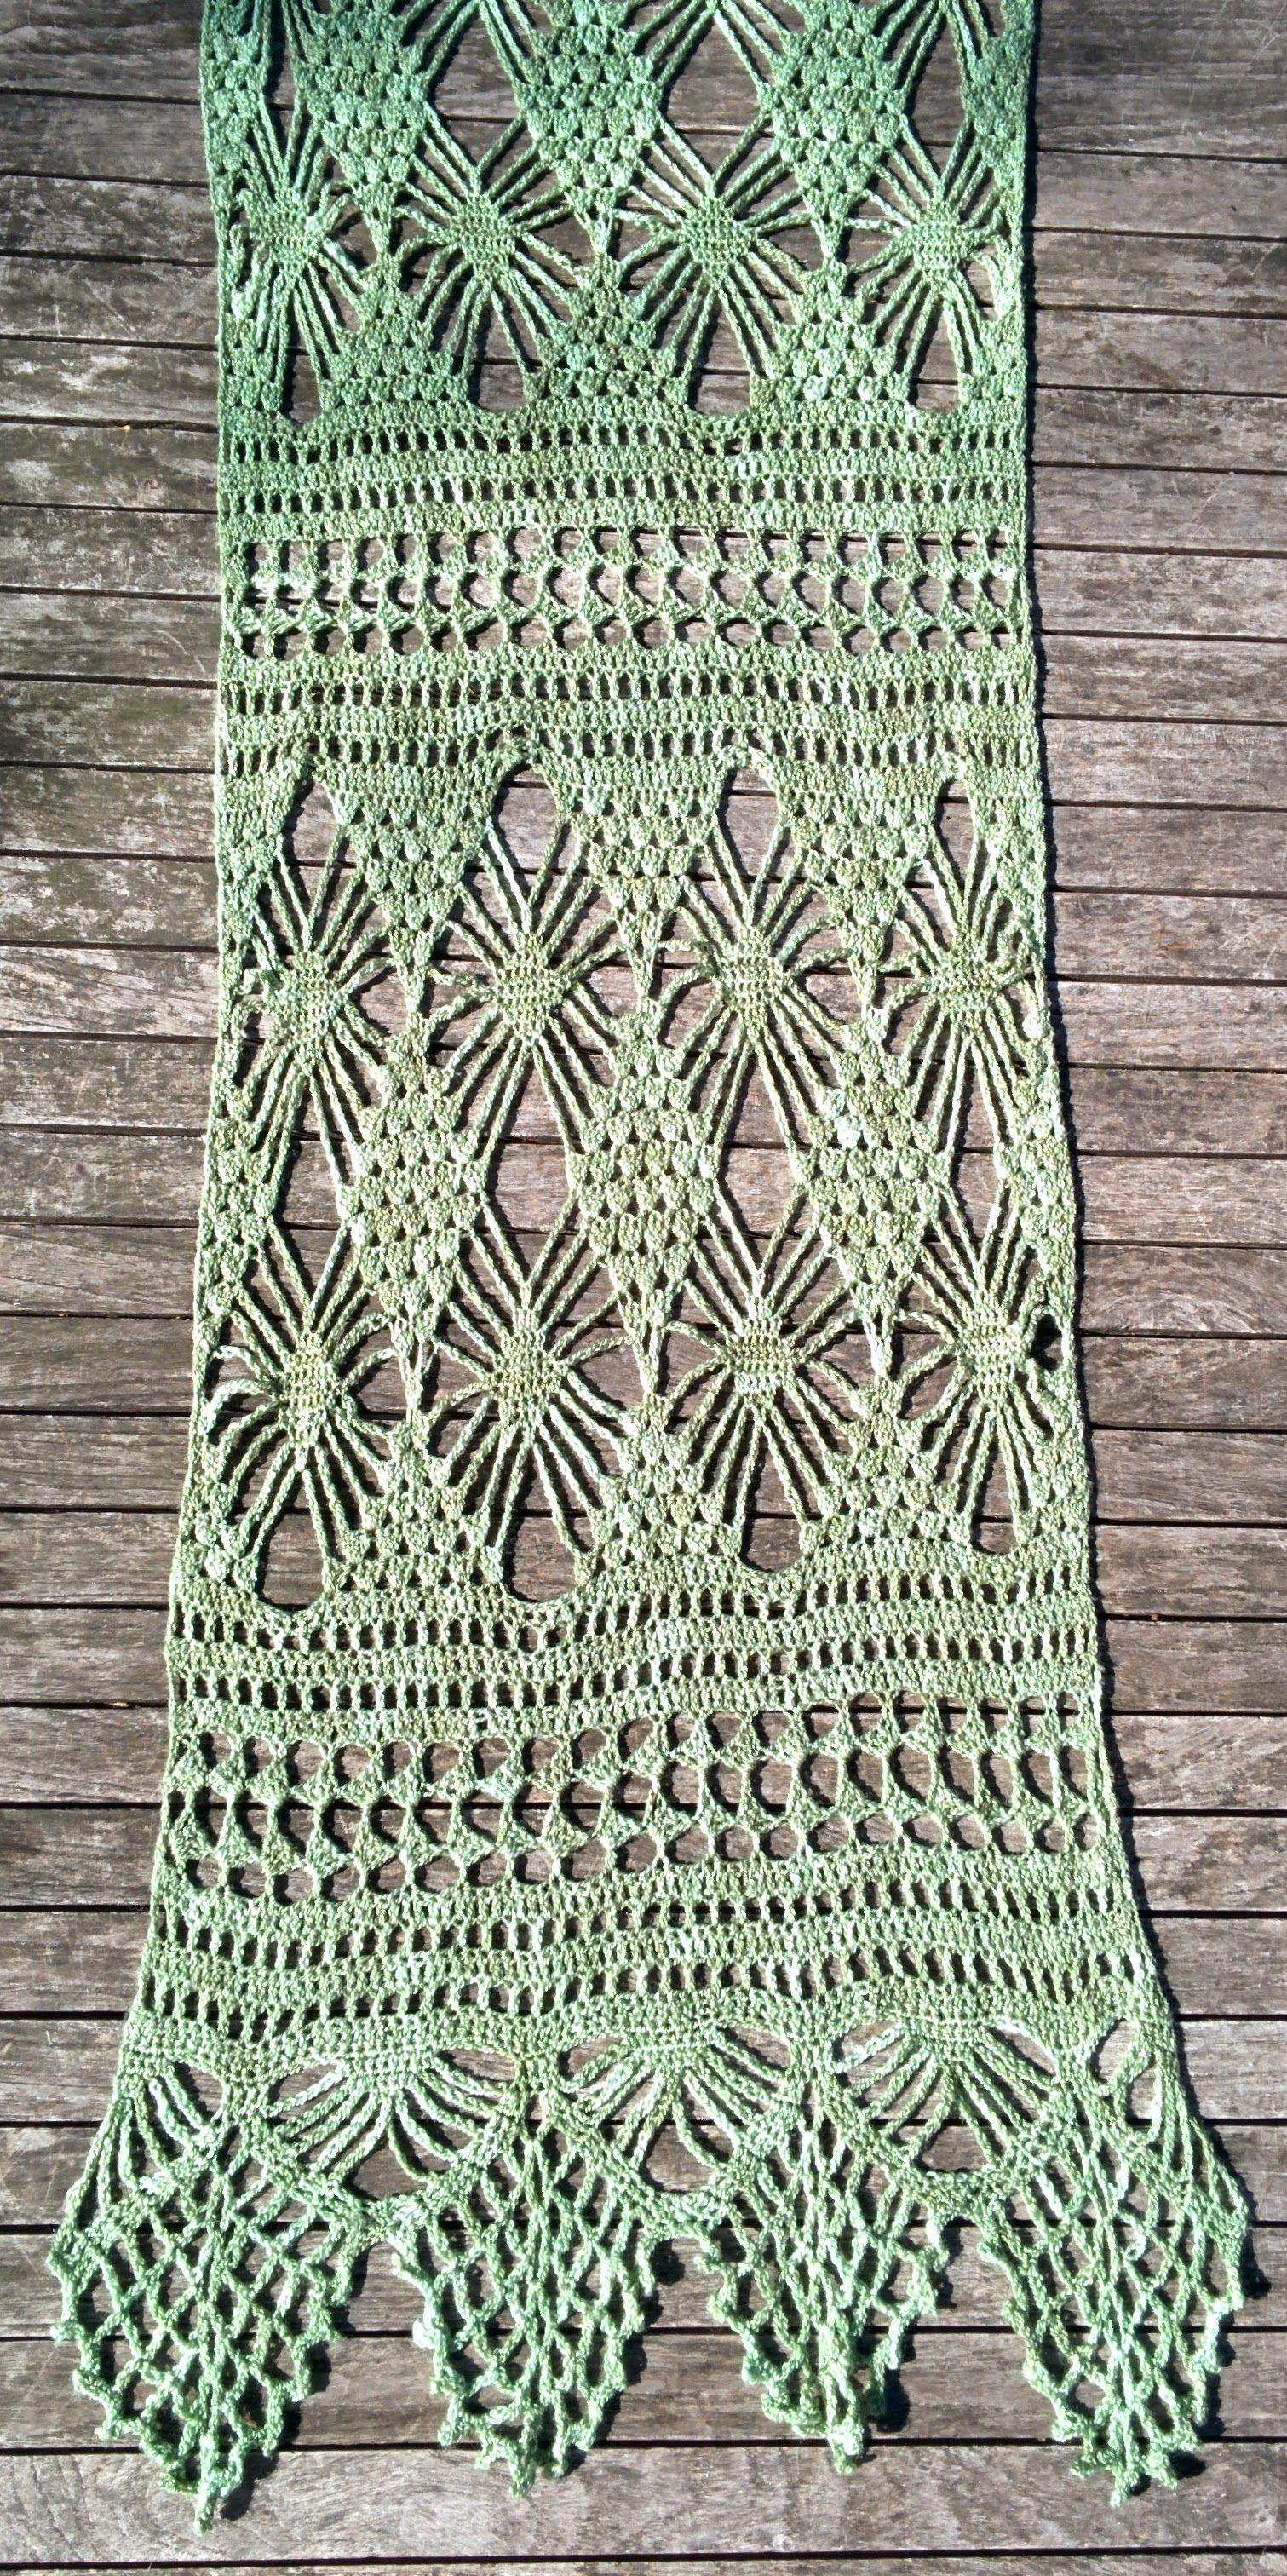 Pin de Lainey Marie en Crochet/Knit Scarves | Pinterest | Chal ...